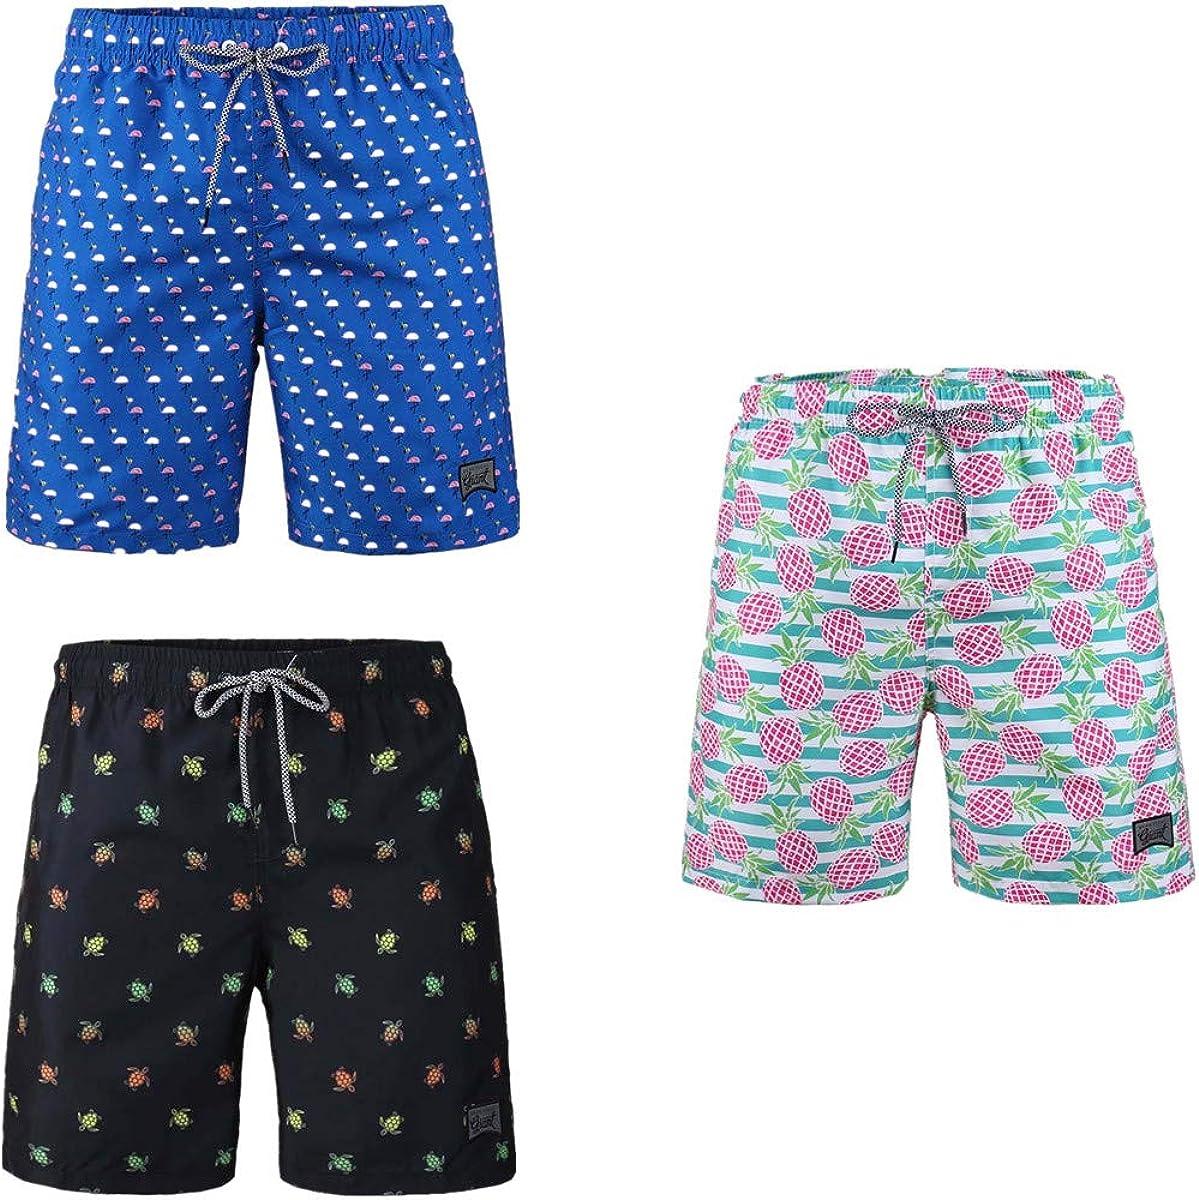 Beautiful Giant 3 Pack Men's Board Shorts Drawstring Casual Beach Swimming Lightweight Quick Dry Swimwear